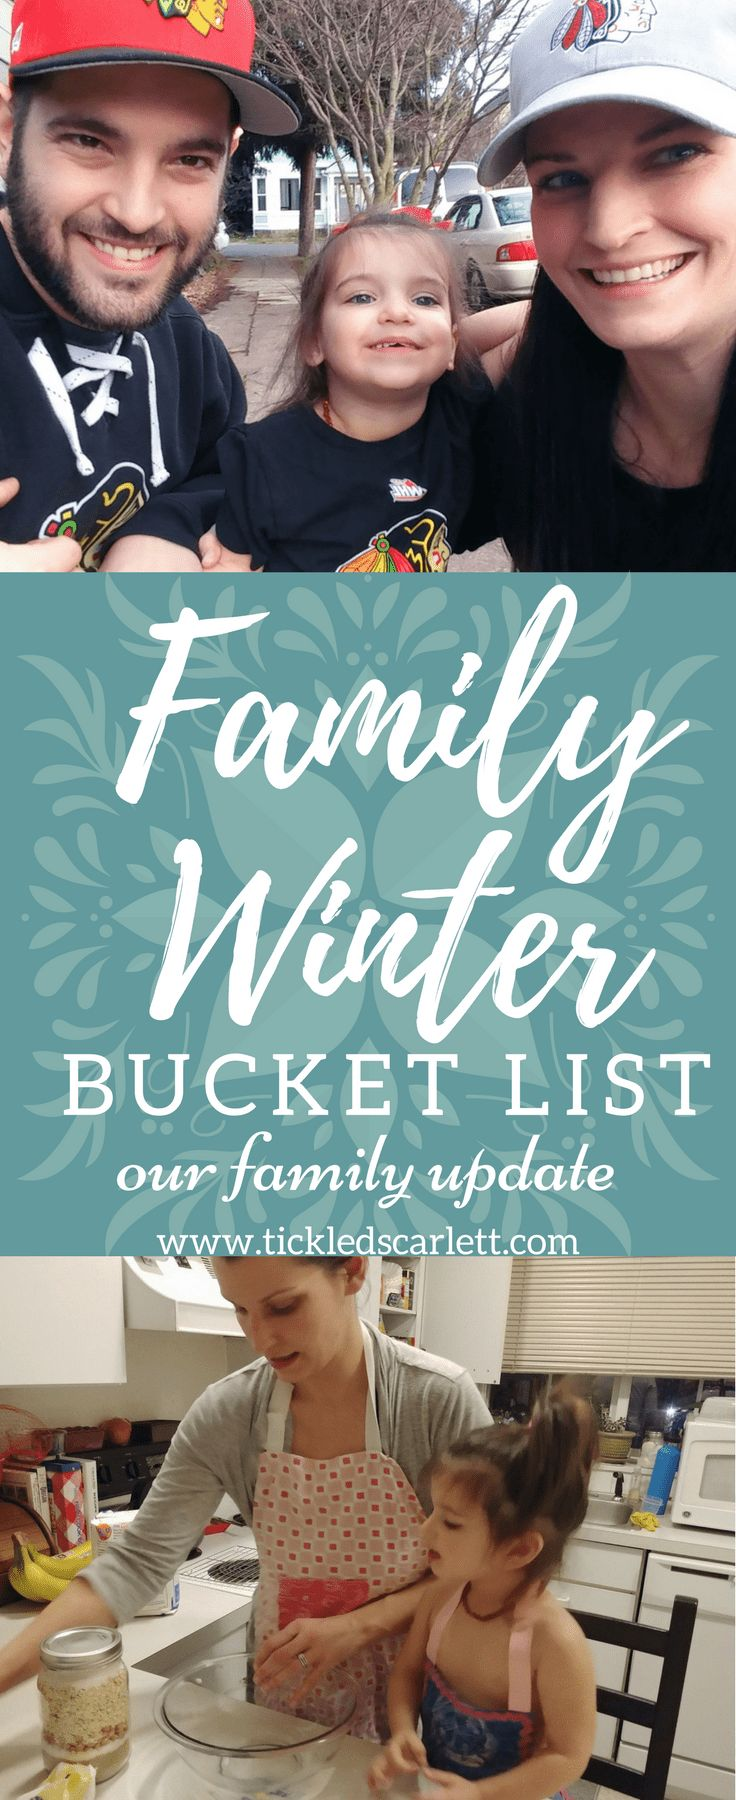 Our Family Winter Bucket List Update-Tickled Scarlett Blog